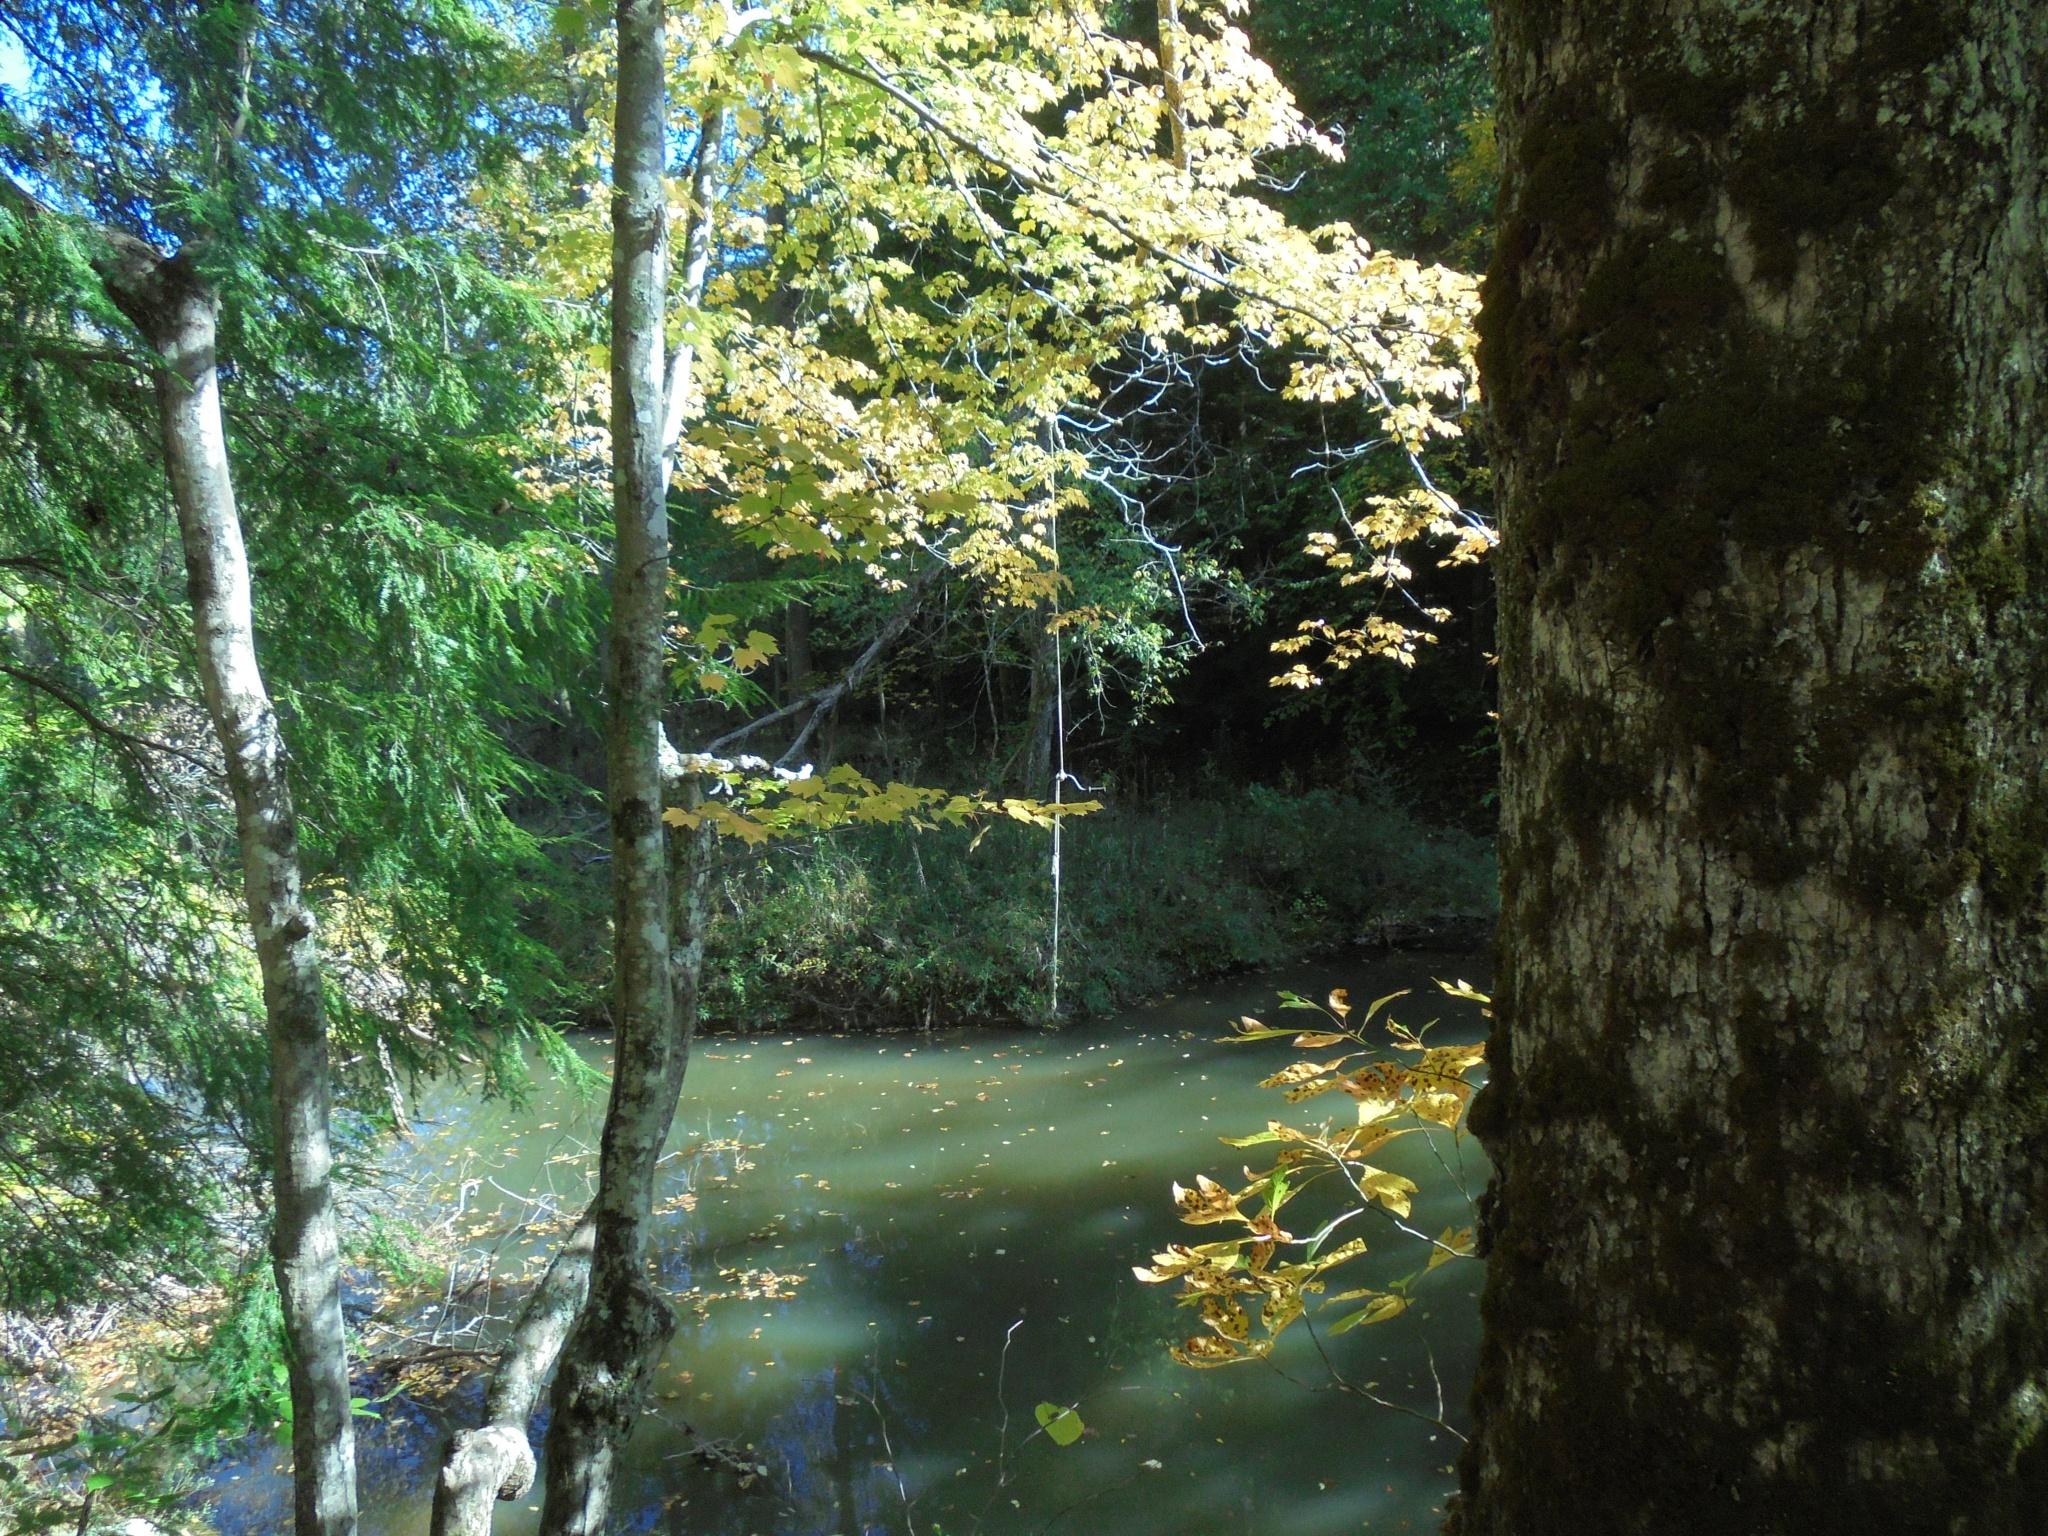 Bethel swimming hole in McKim Creek, West Virginia by conniemossor